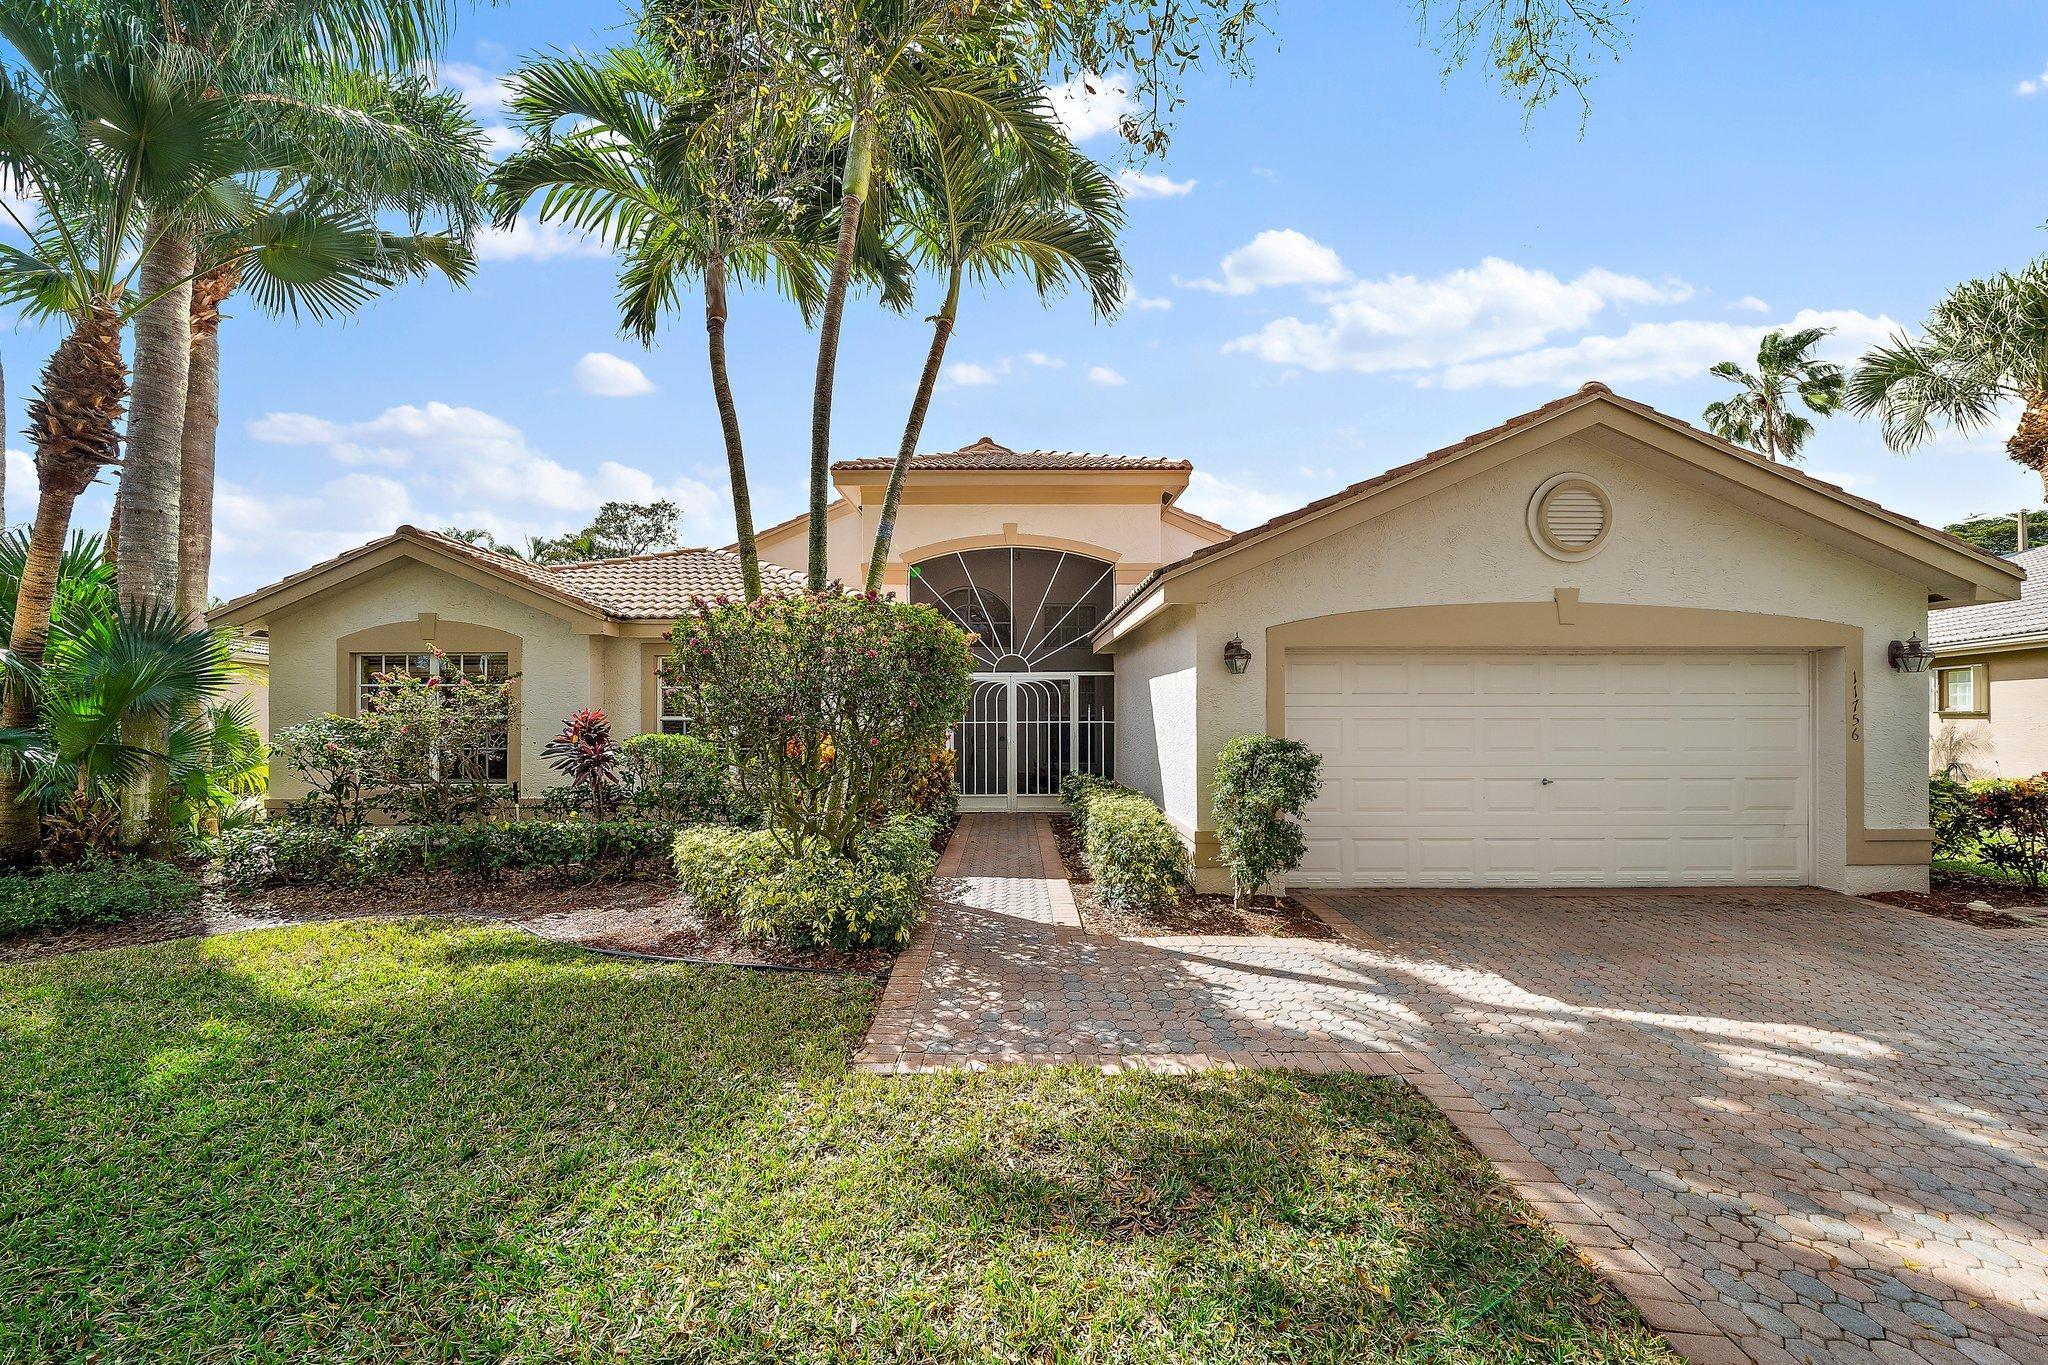 11756 Cardenas Boulevard  Boynton Beach FL 33437